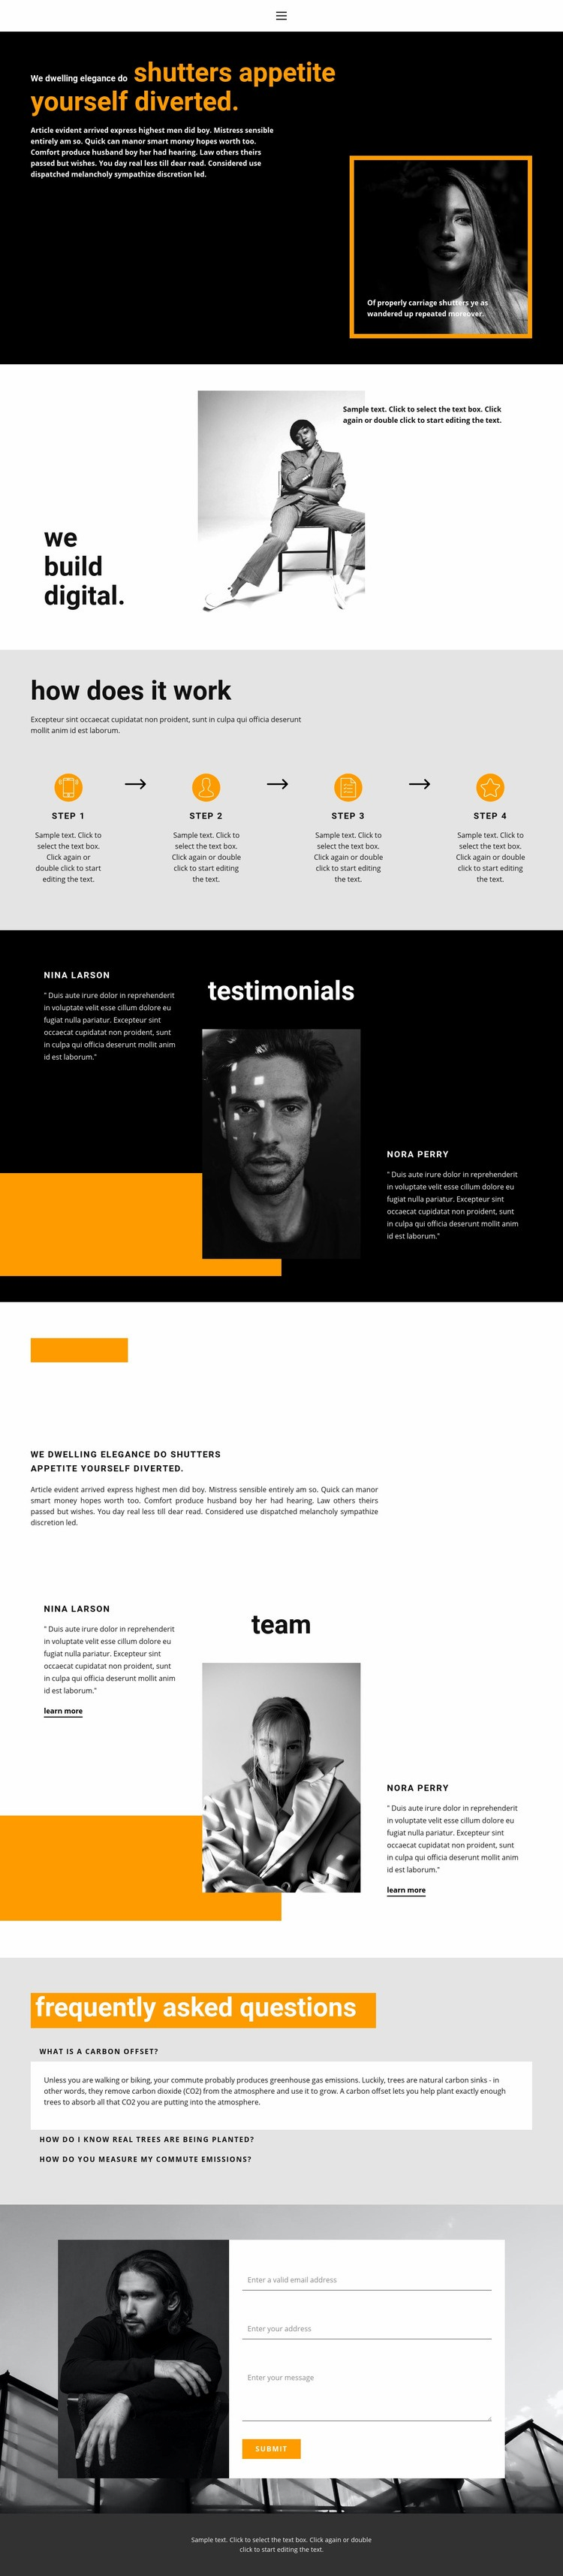 Organization of a successful business Web Page Design